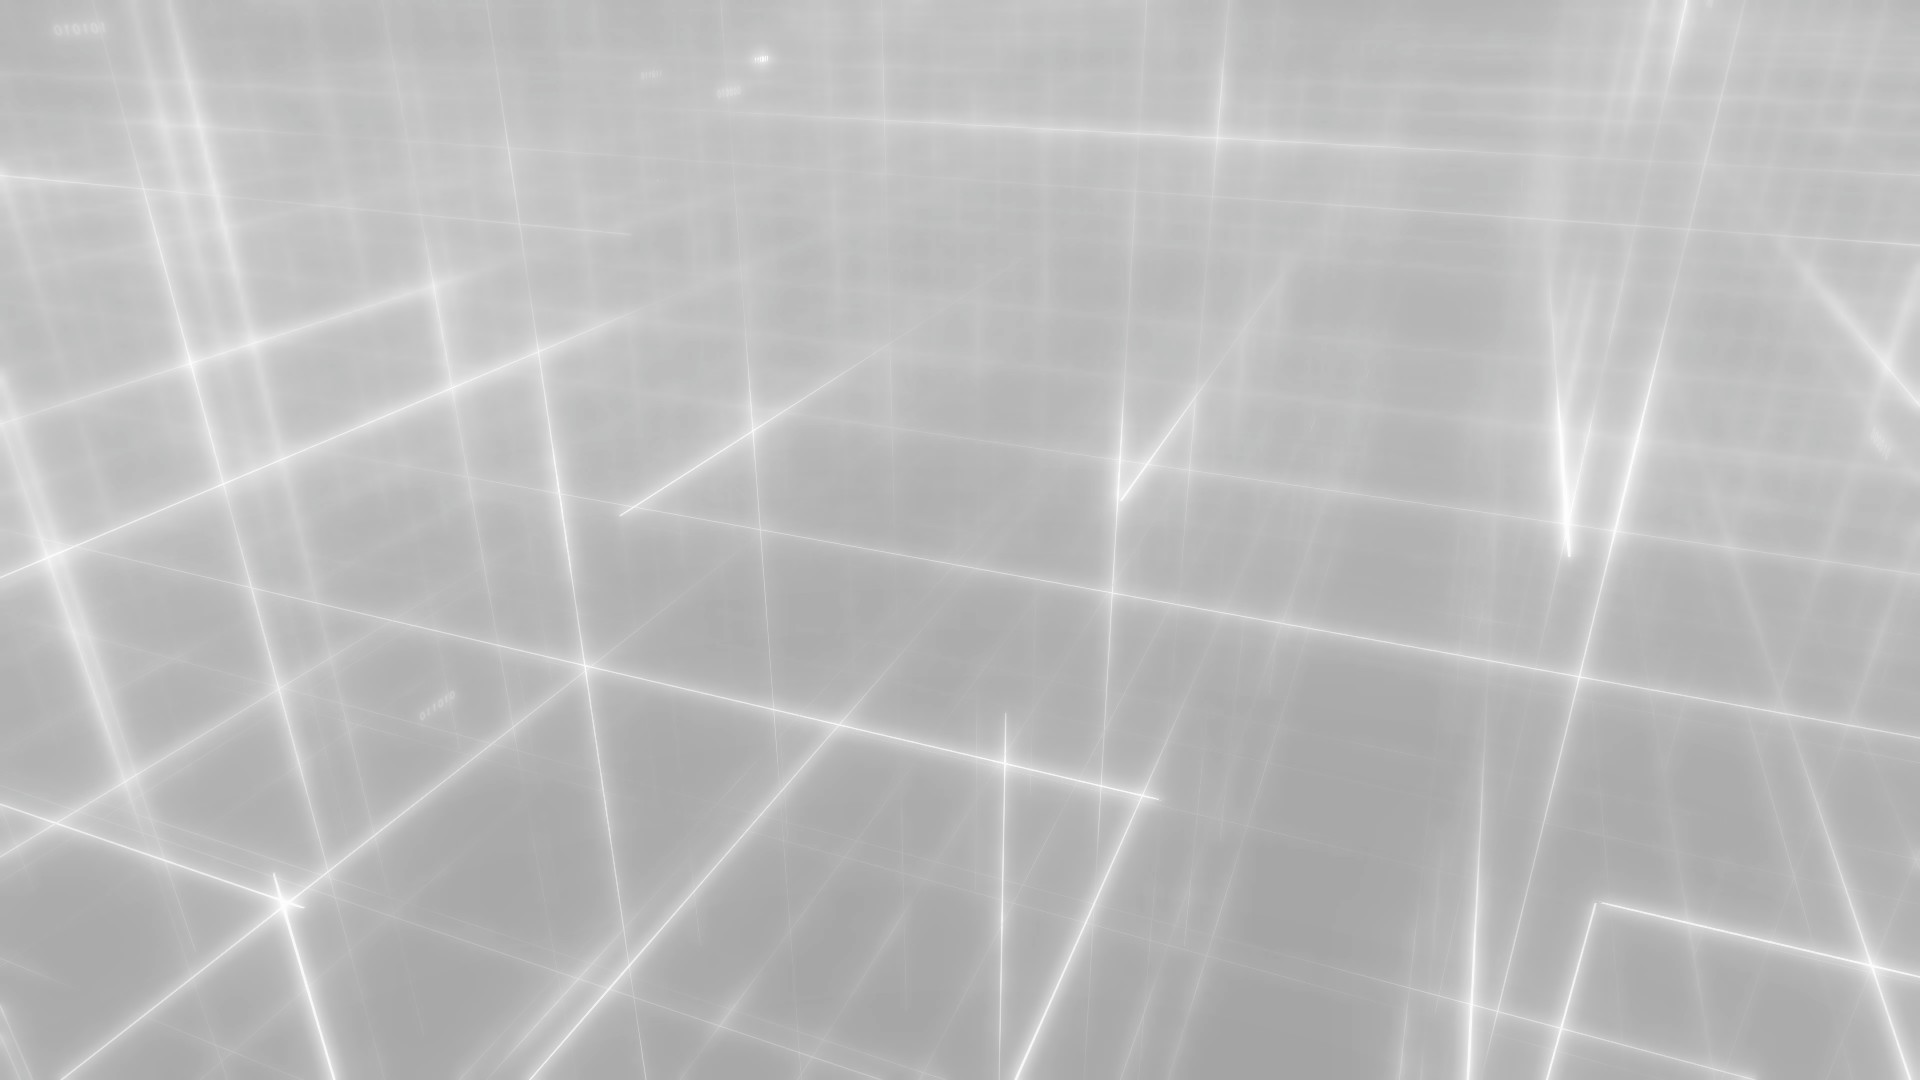 Light HD Wallpaper